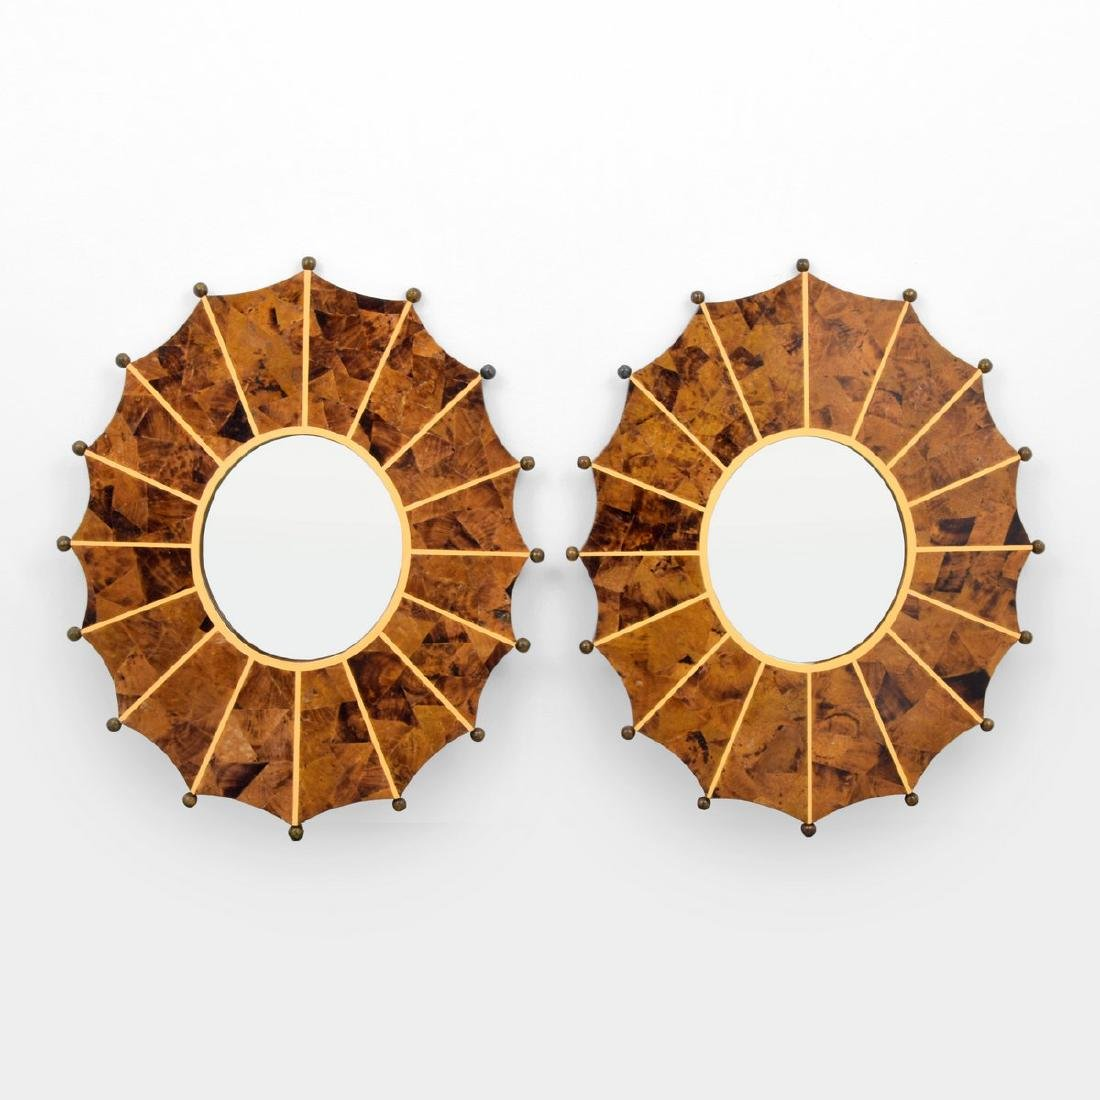 Pair of Mirrors, Manner of Karl Springer